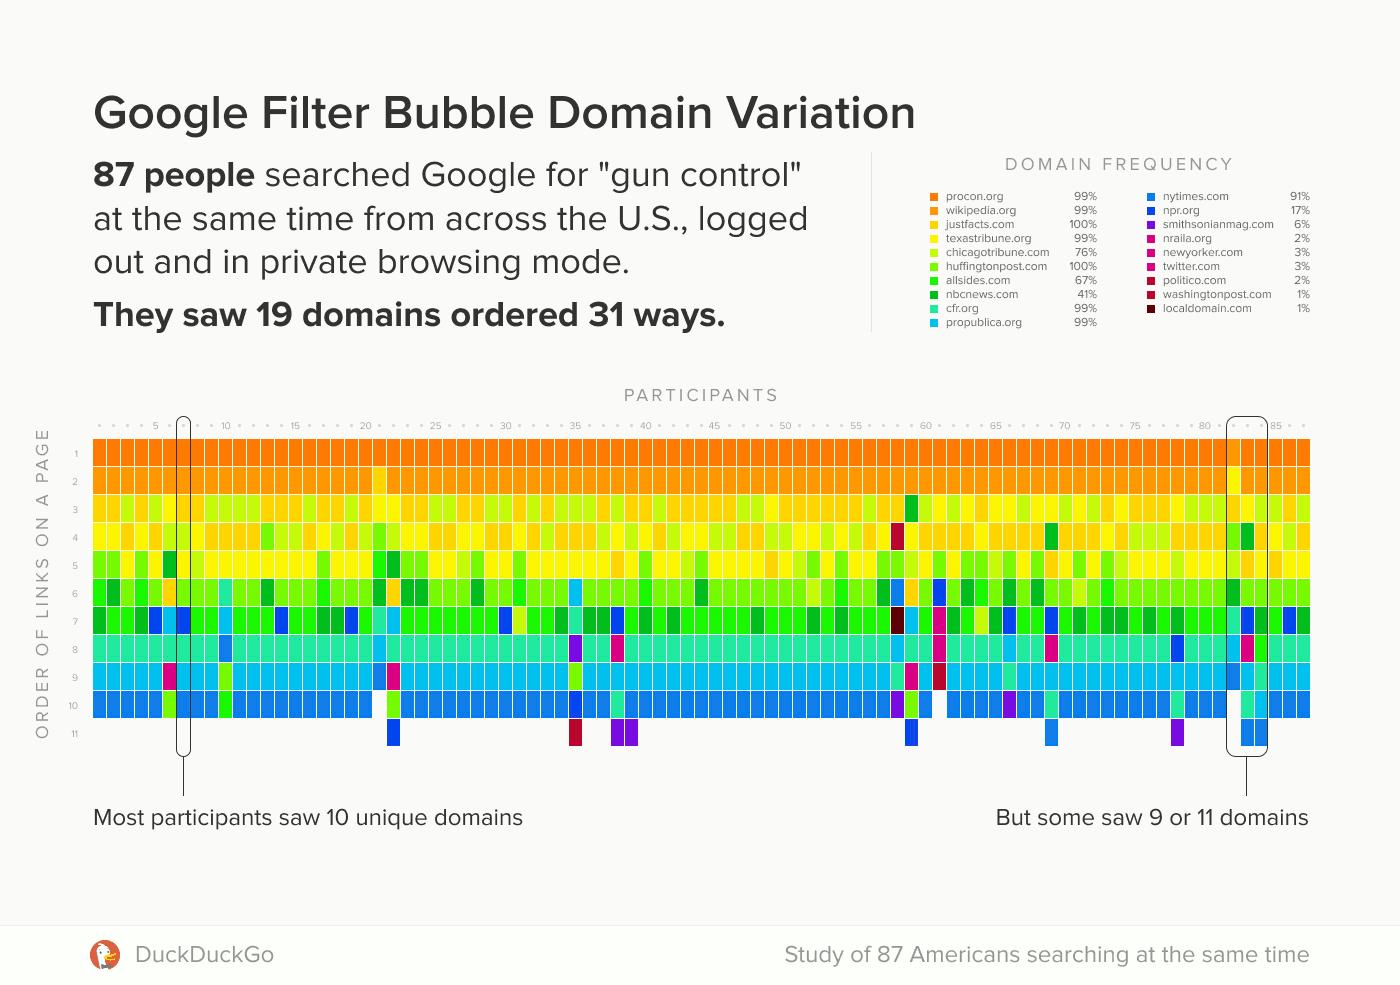 DuckDuckGo Google filter bubble study example